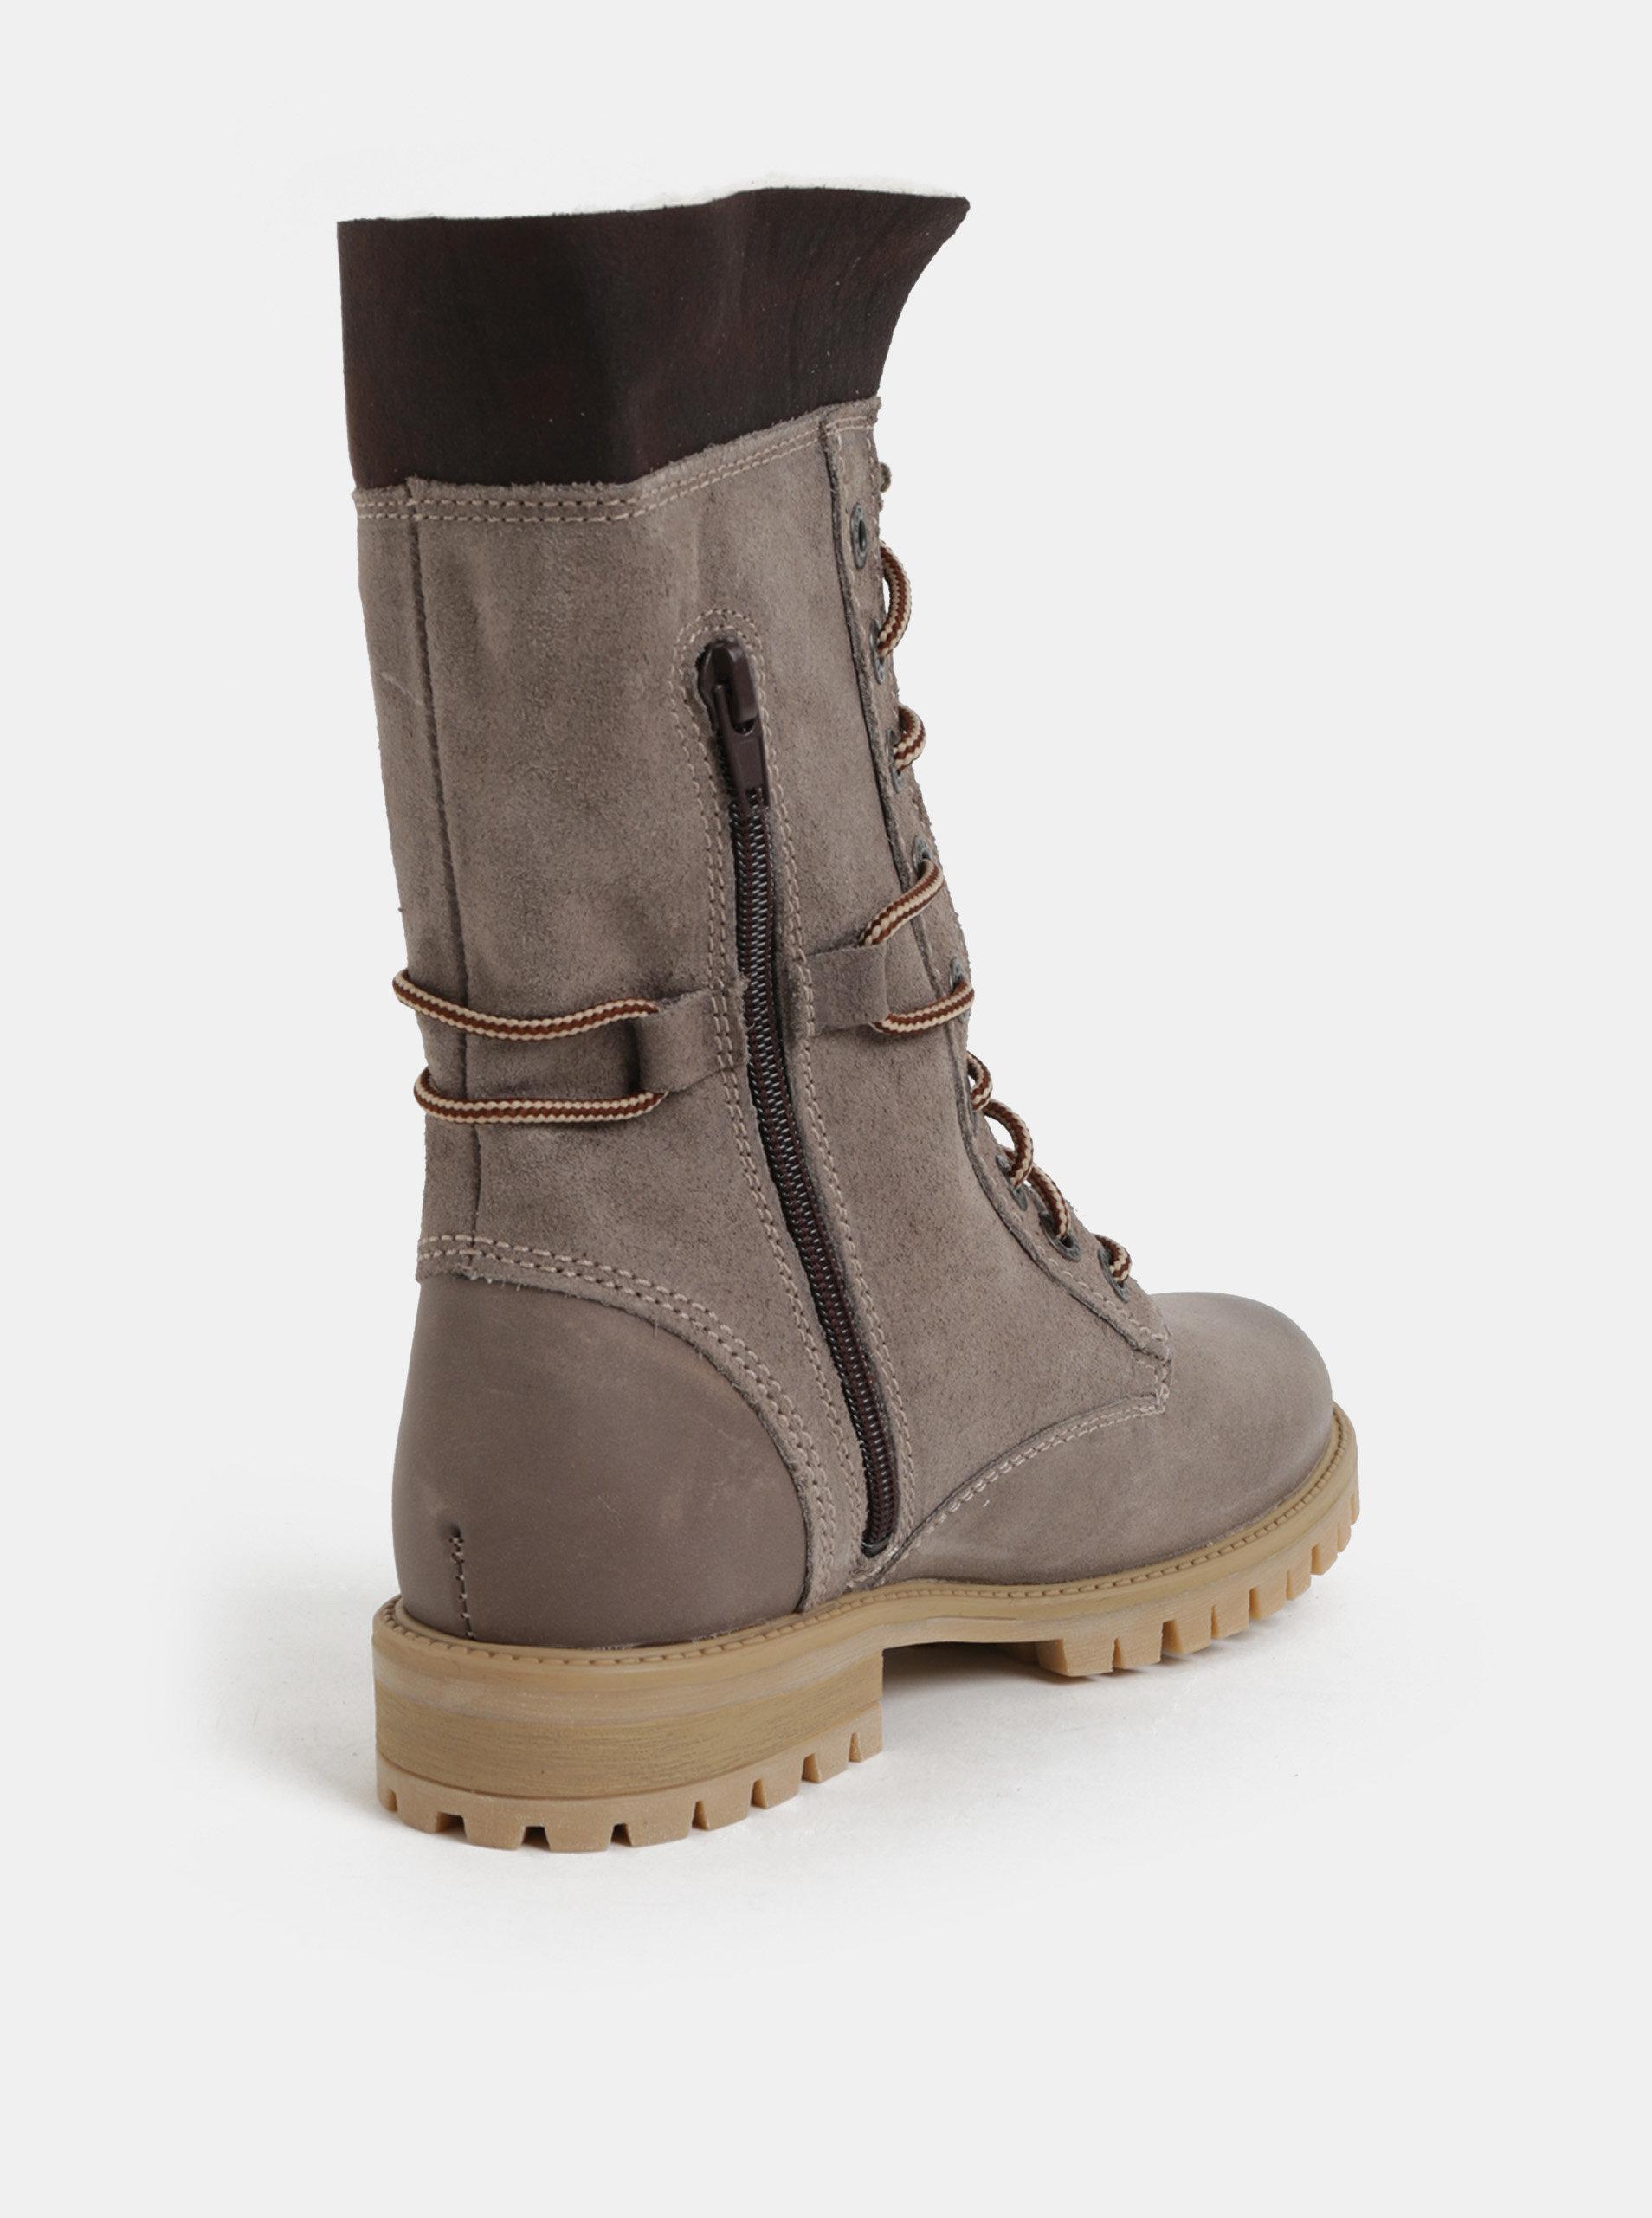 d0904a6f6b91 Sivé dámske semišové členkové zimné topánky so šnurovaním Weinbrenner ...